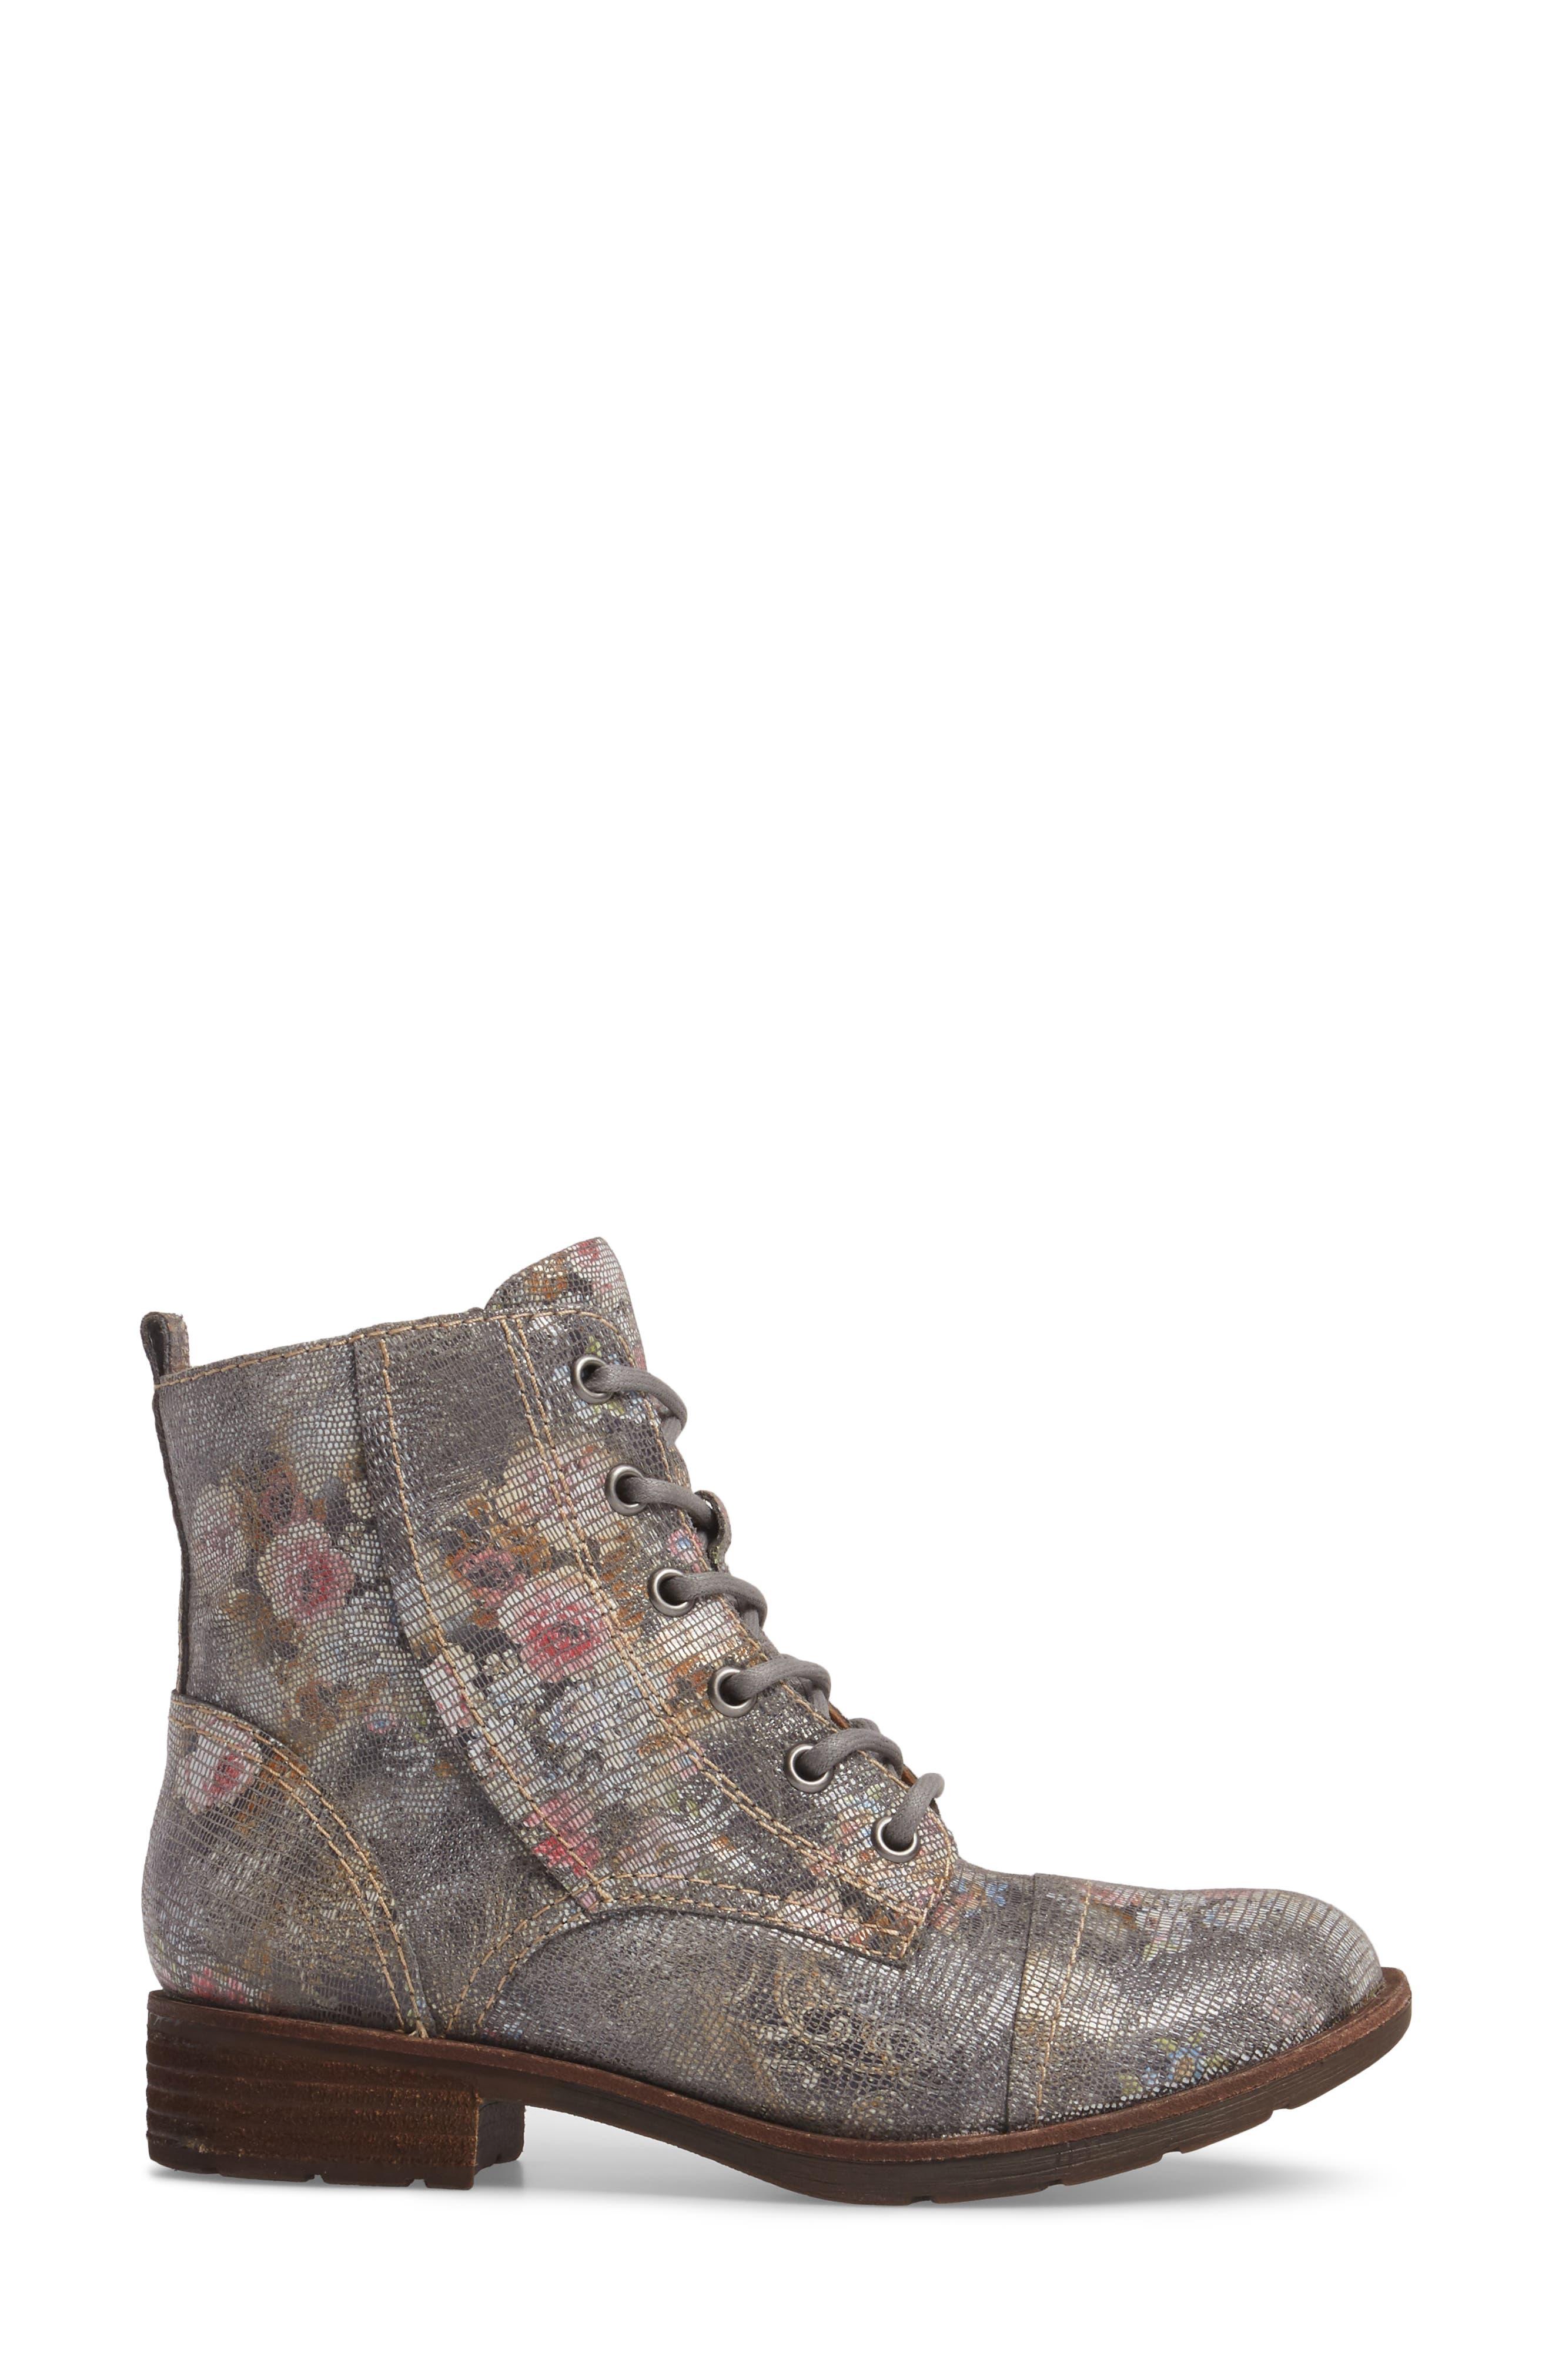 Belton Cap Toe Combat Boot,                             Alternate thumbnail 3, color,                             Grey Leather